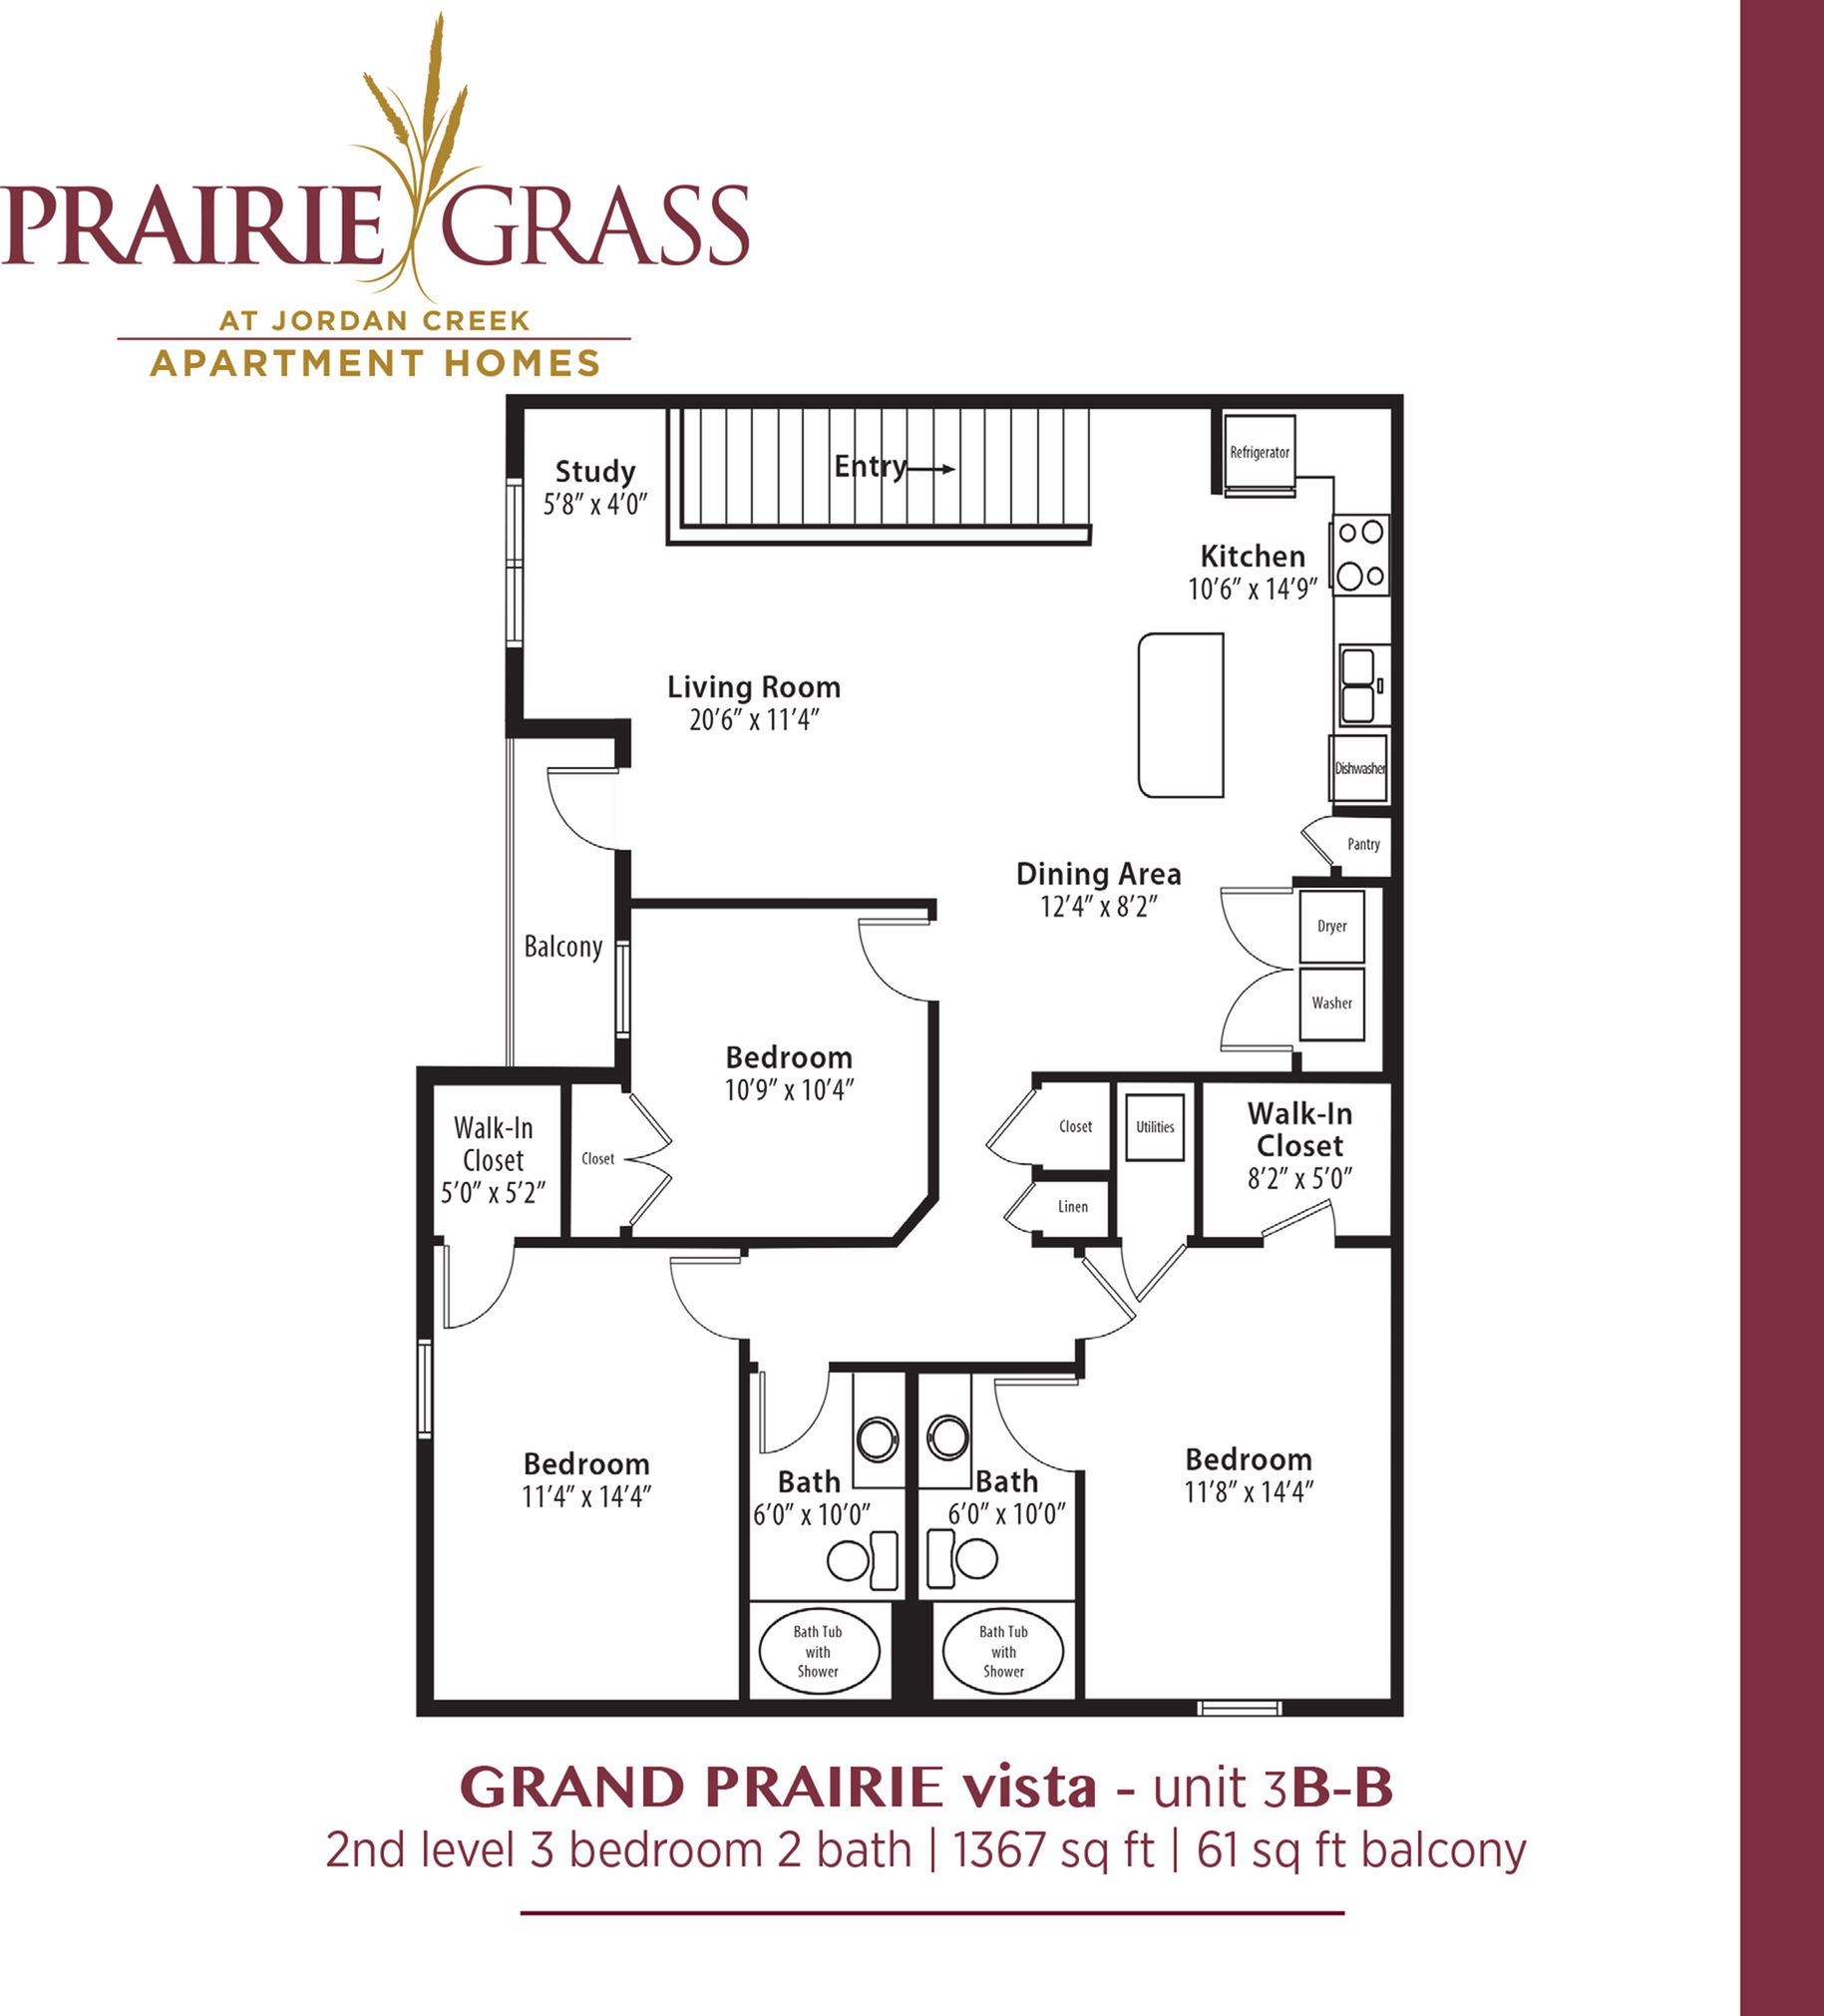 GrandPrairie Vista - Upper 3 Bedroom with Balcony